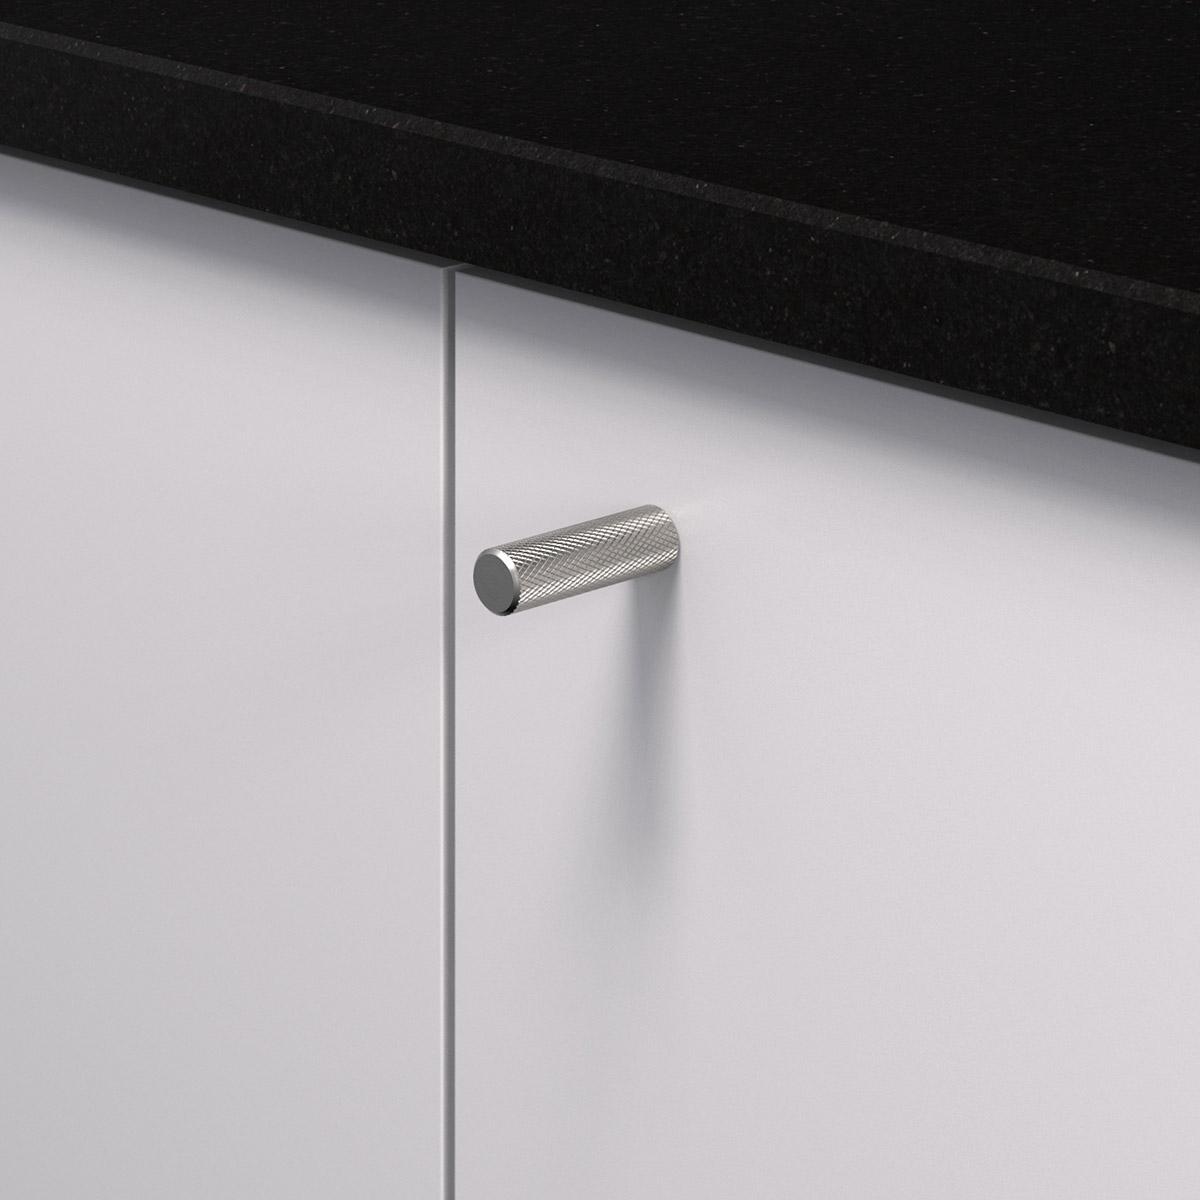 Knopp rostfri look 370225 11 10 mm ncs s 3000 n granit svart